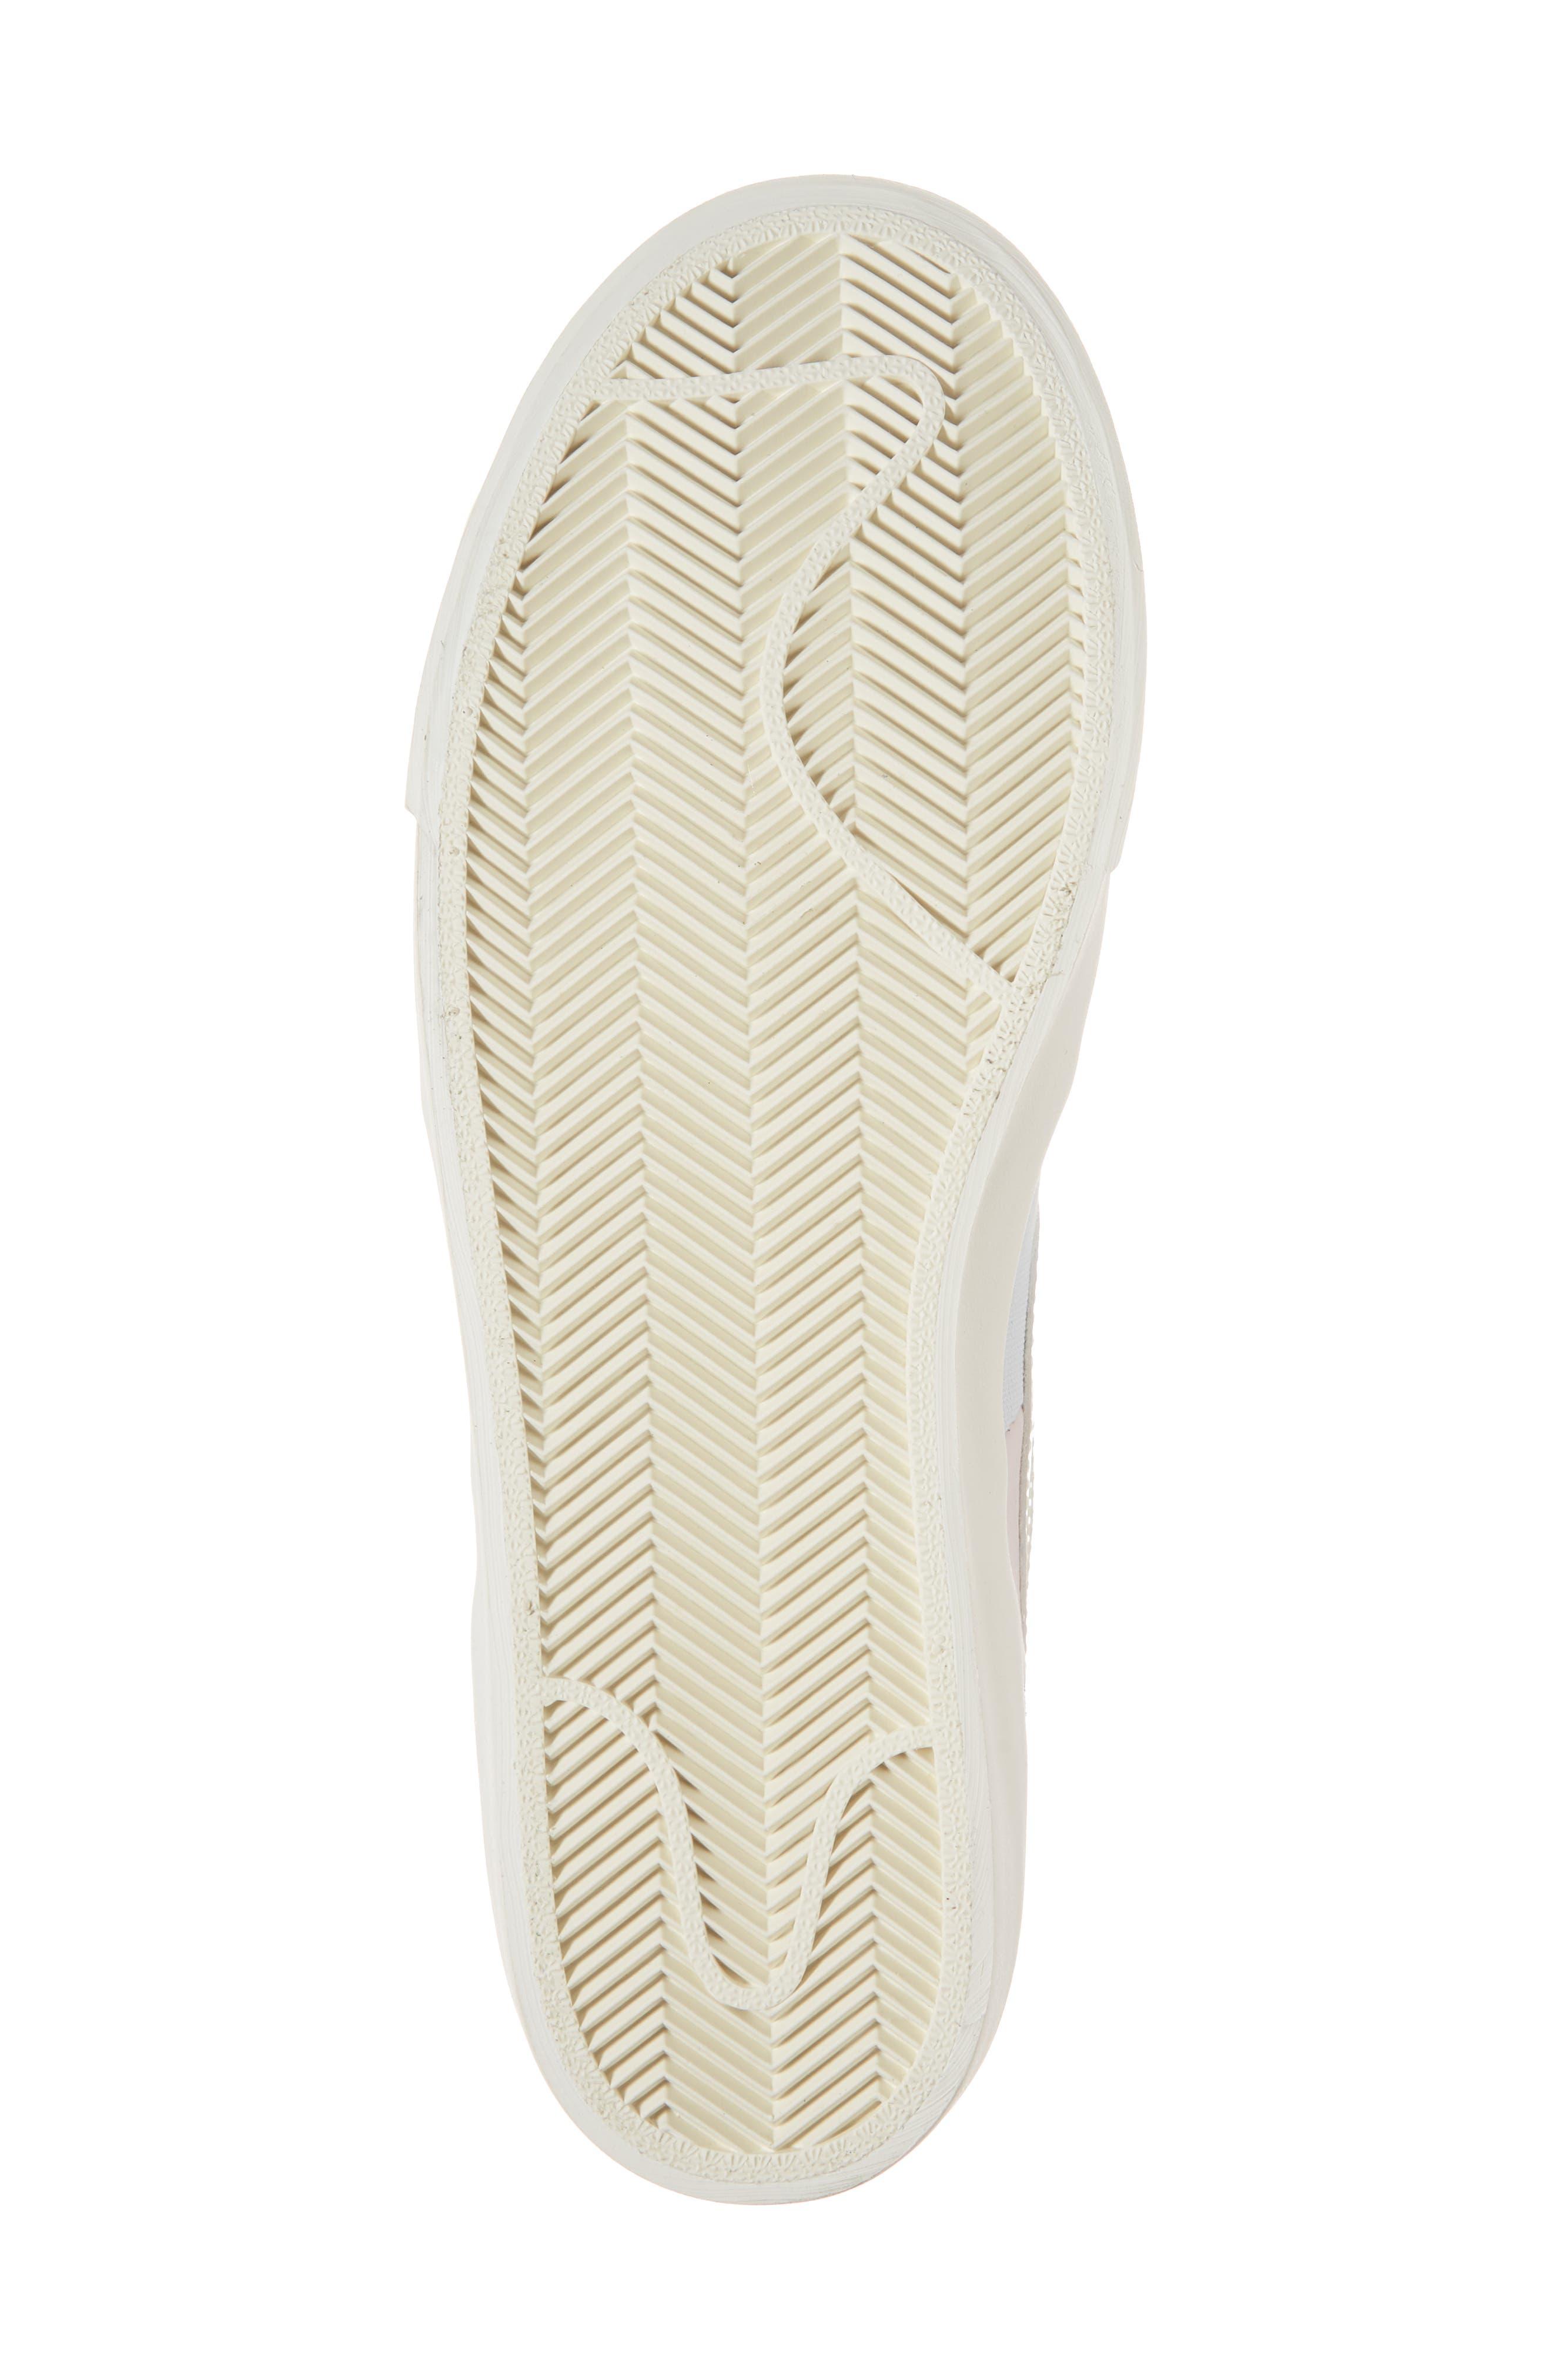 Blazer Royal Easter QS High Top Sneaker,                             Alternate thumbnail 6, color,                             650